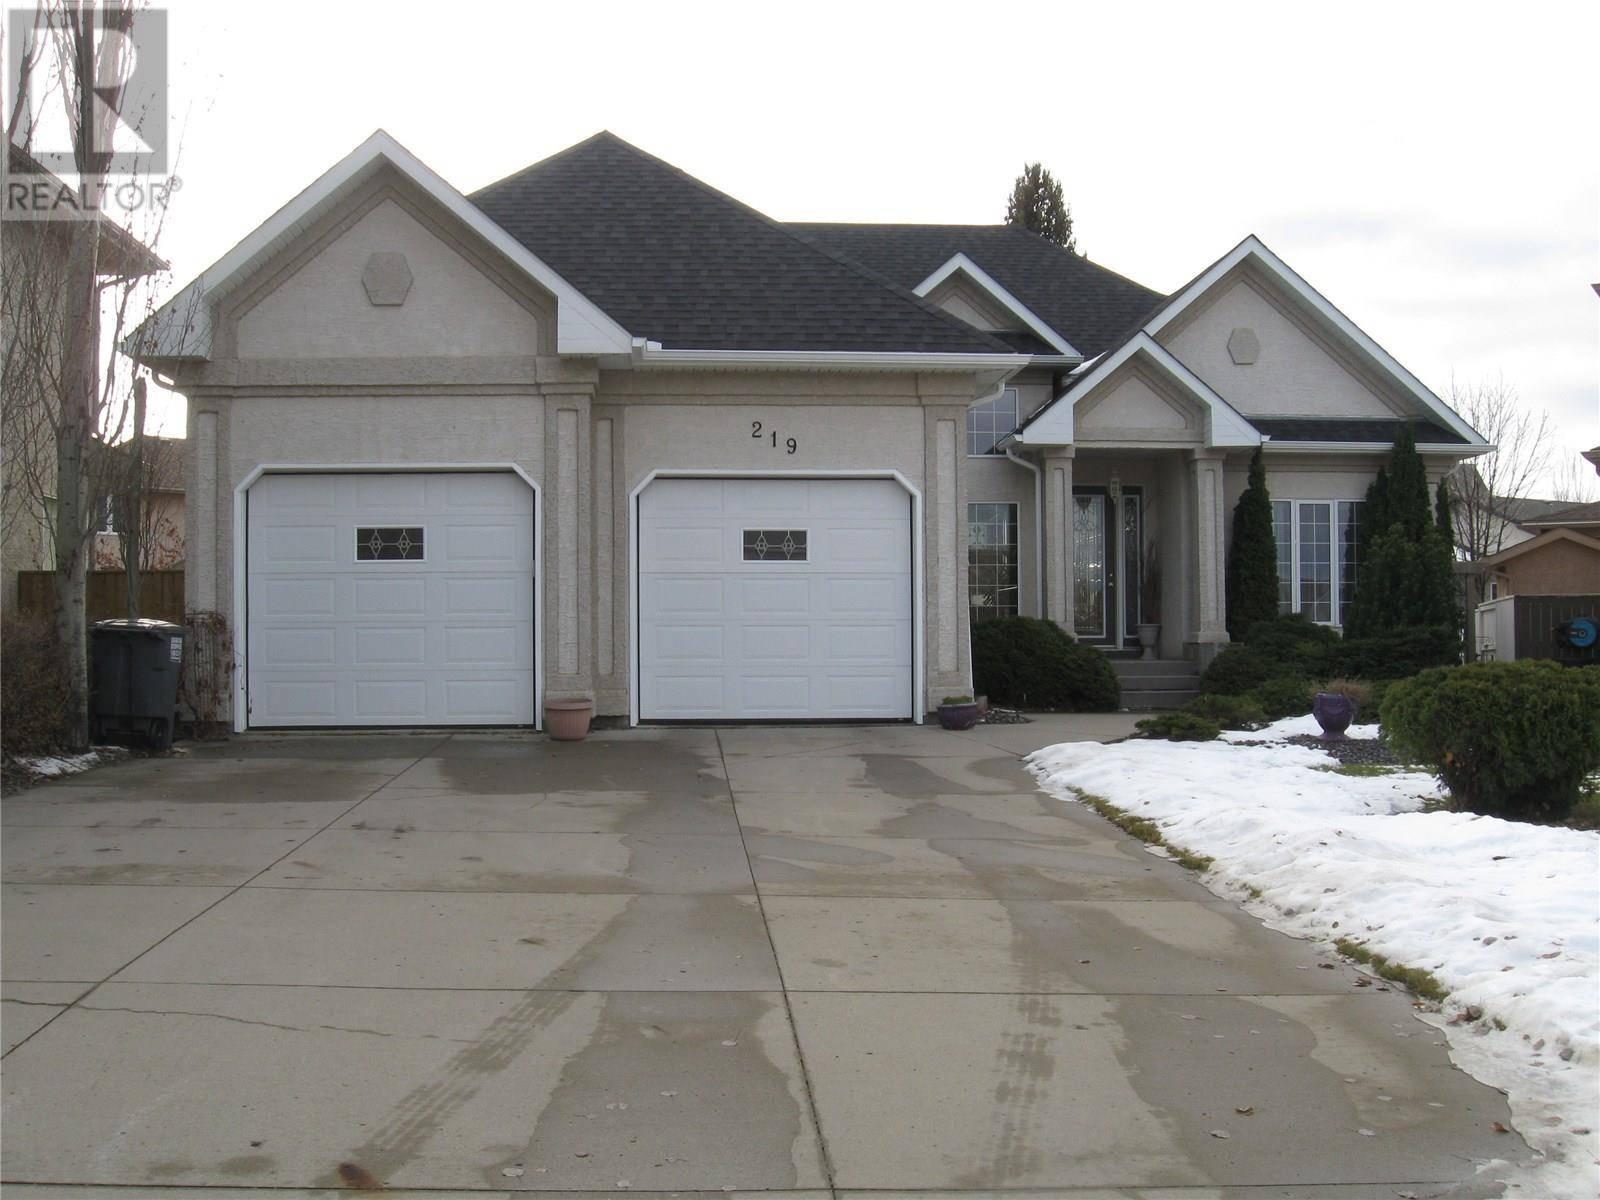 House for sale at 219 Wright Cres Saskatoon Saskatchewan - MLS: SK787664